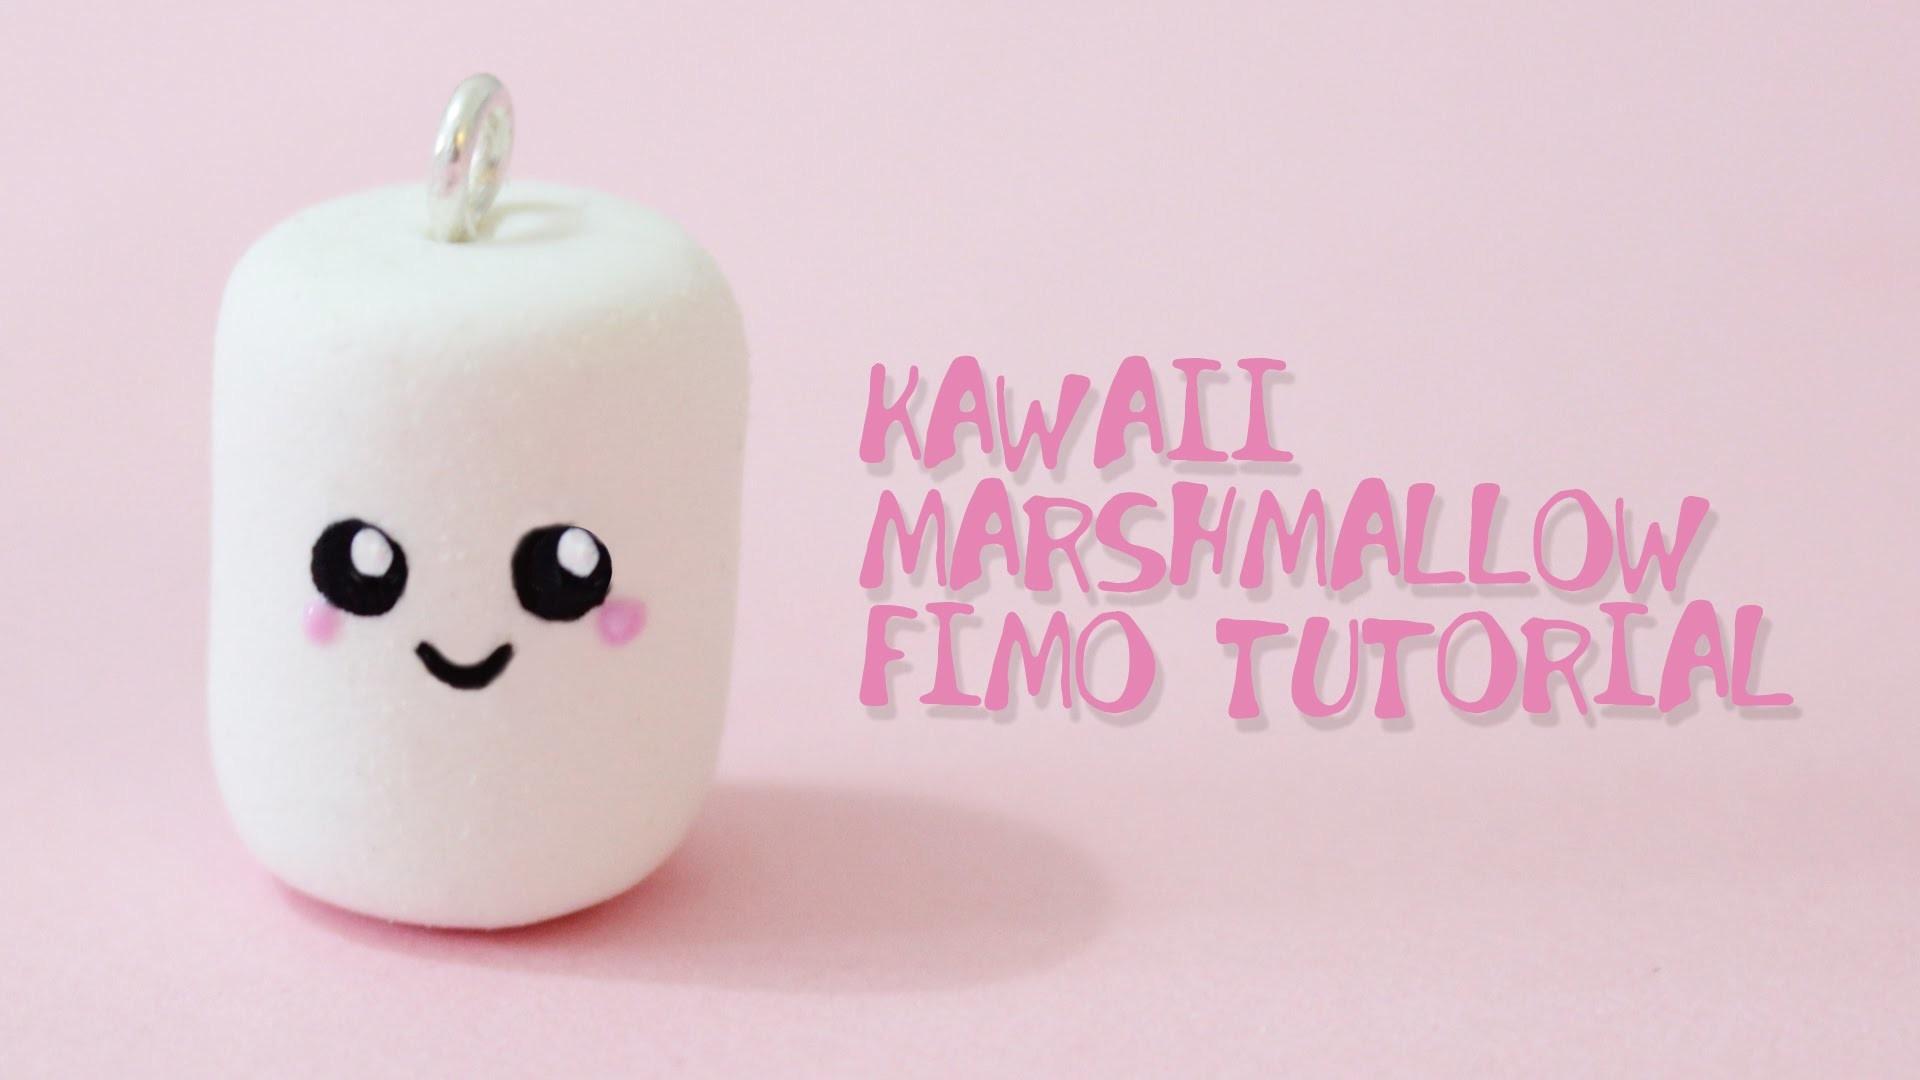 [Fimo Friday] Kawaii Marshmallow Fimo Tutorial. Kawaii Marshmallow polymer clay | Anielas Fimo